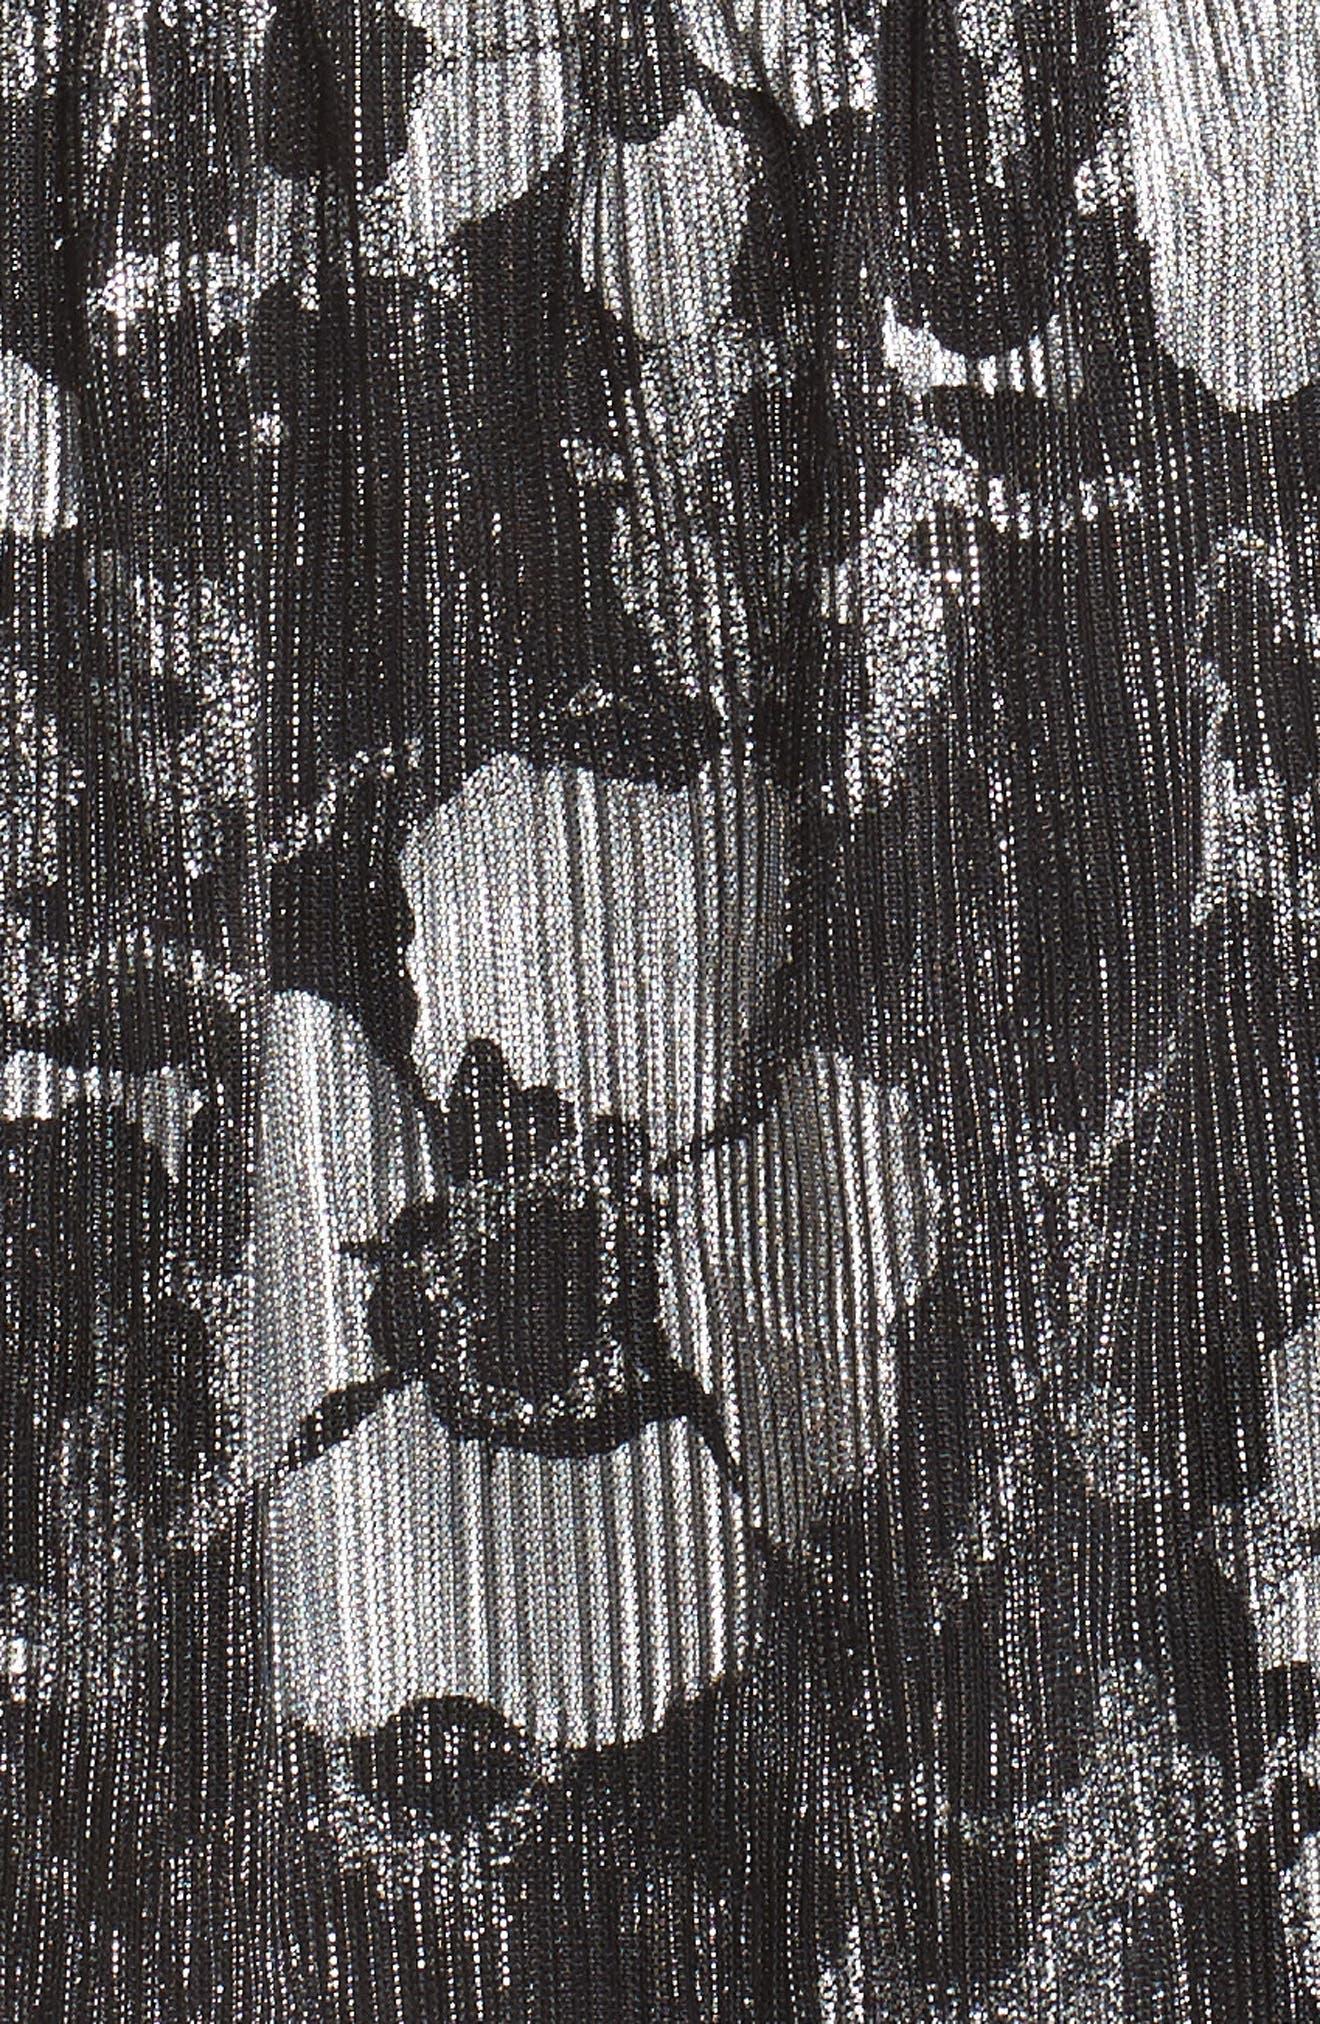 Floral Metallic Midi Dress,                             Alternate thumbnail 5, color,                             Black/ Silver Foil